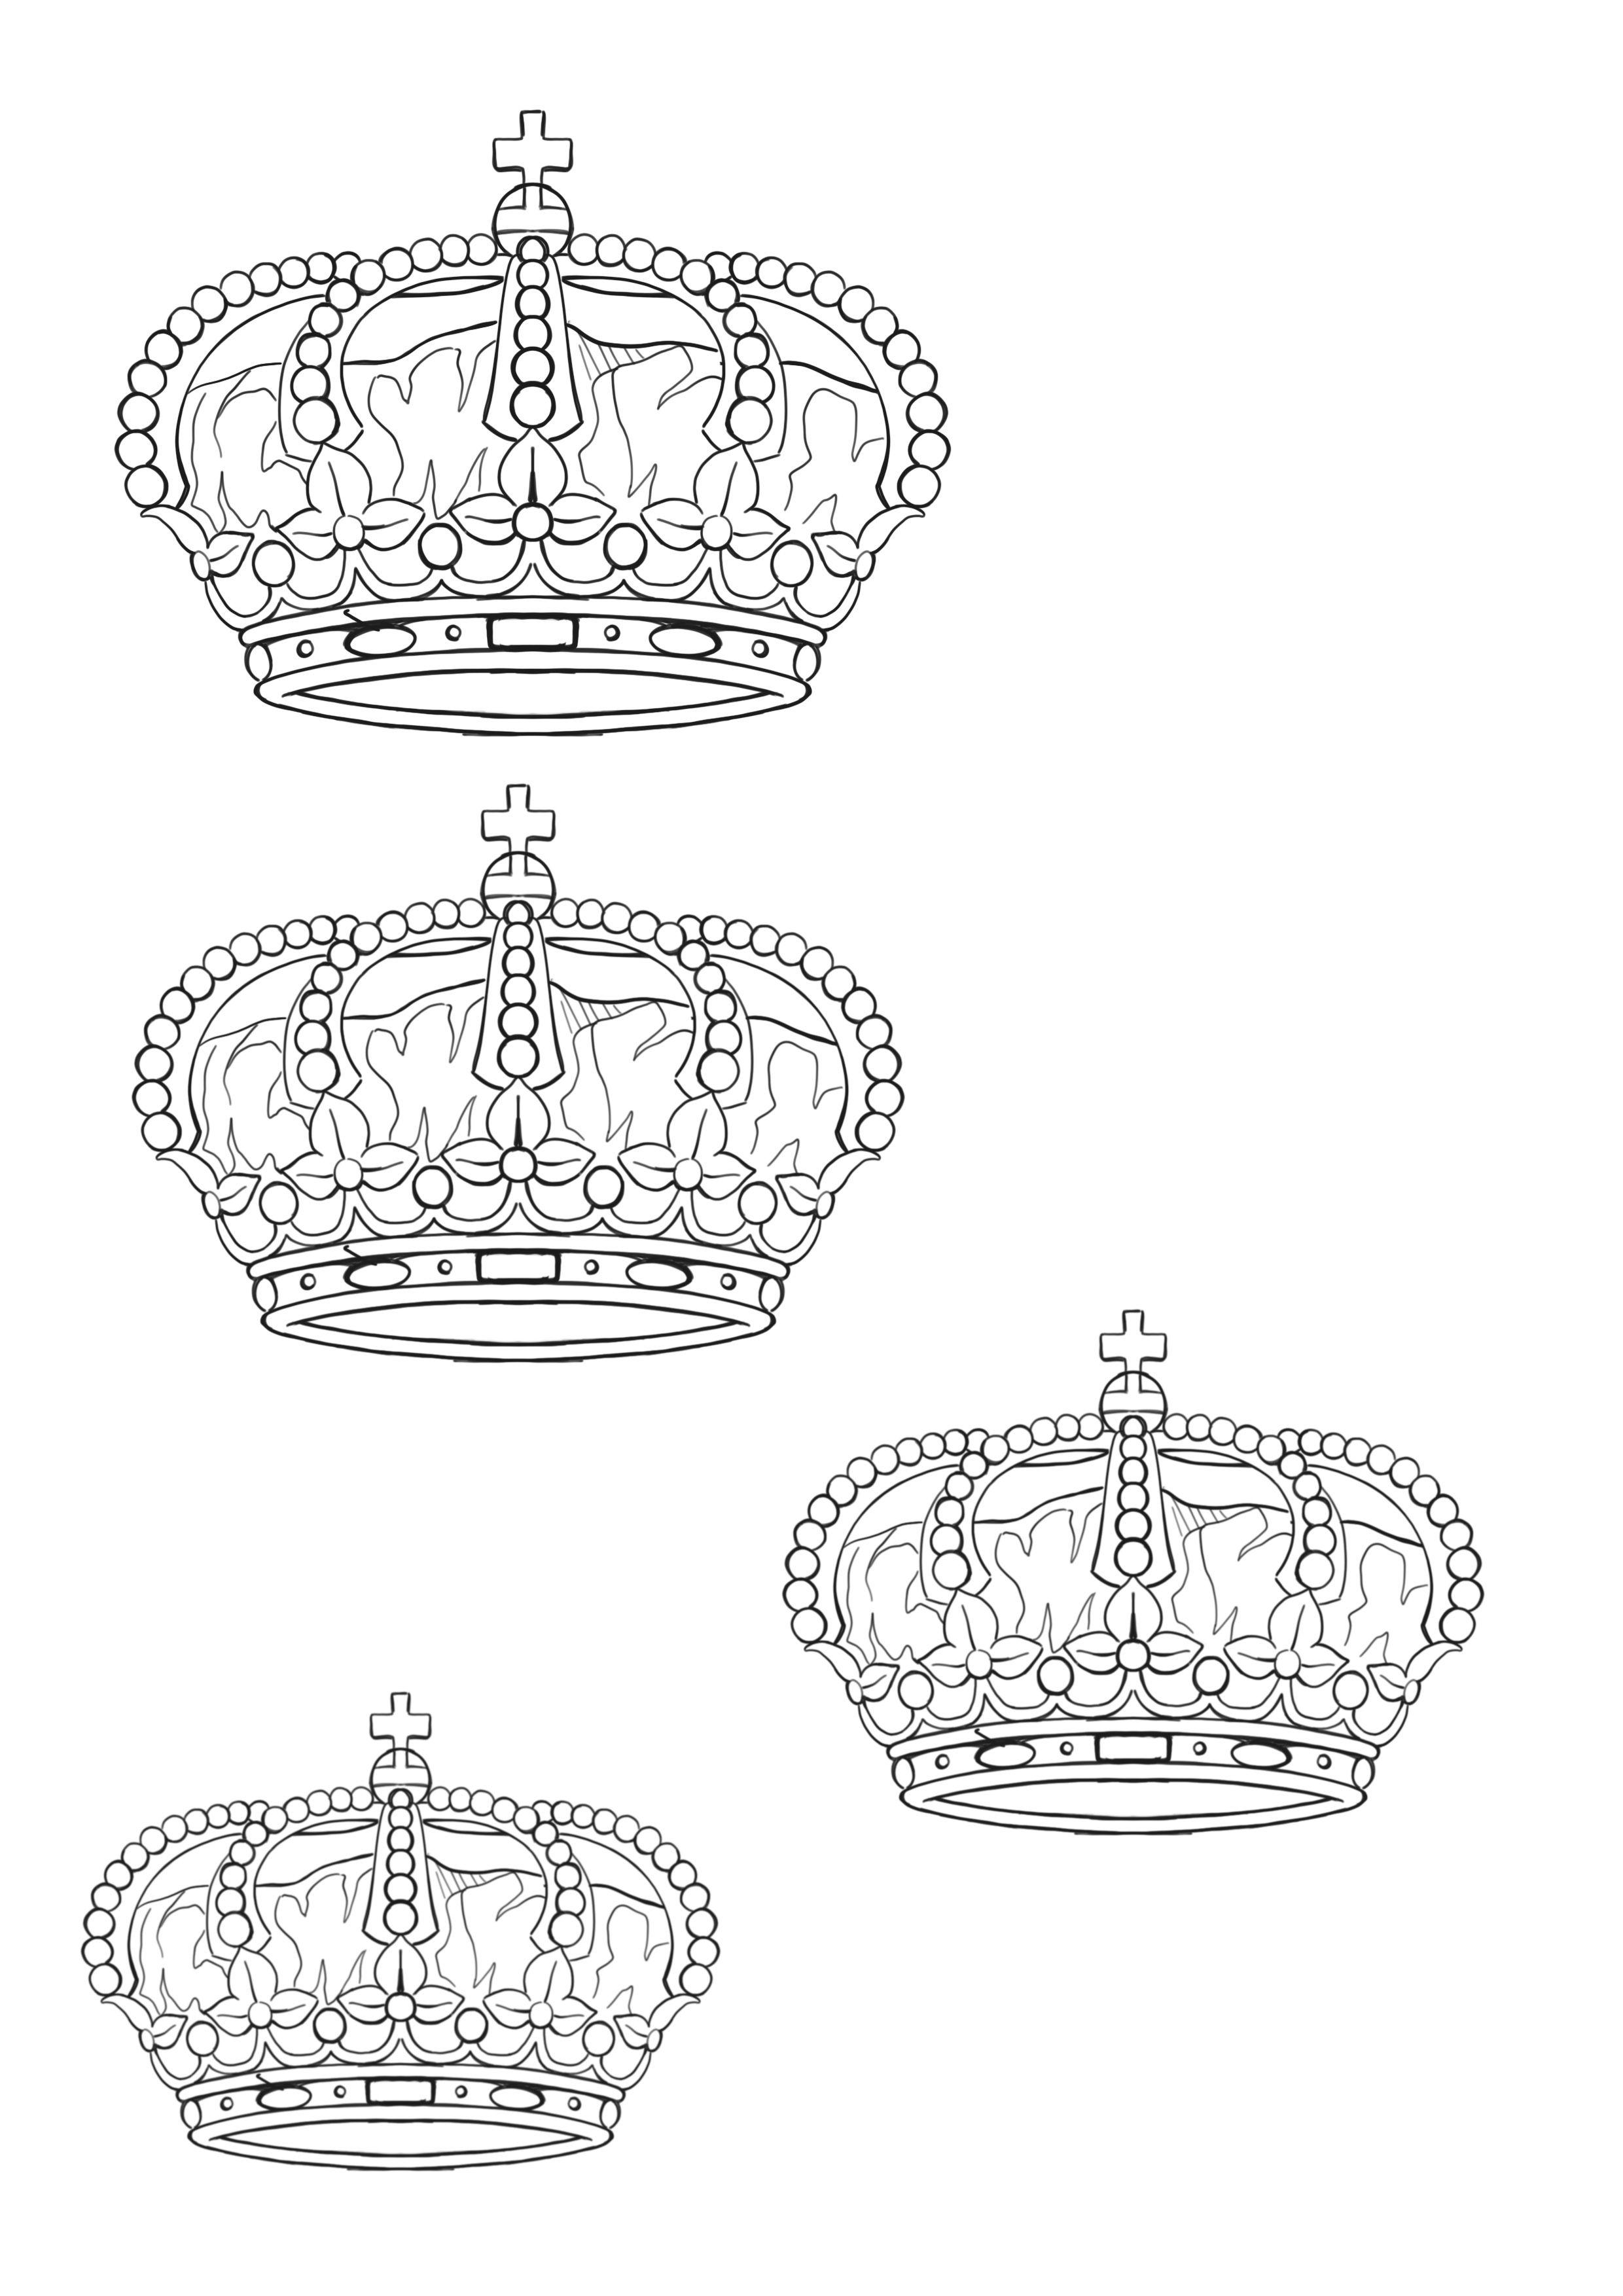 Corona rey king crown | Outlines tattoo (plantillas tatuajes ...